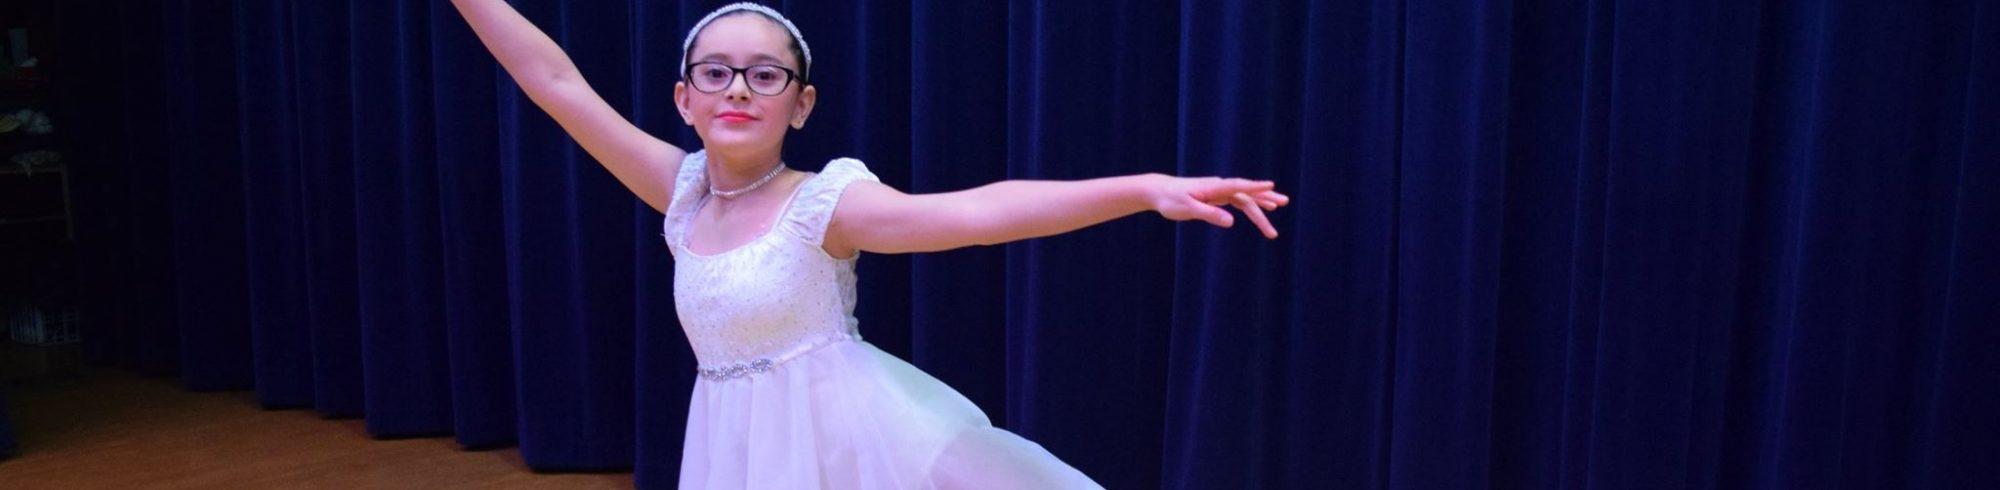 girl performing ballet